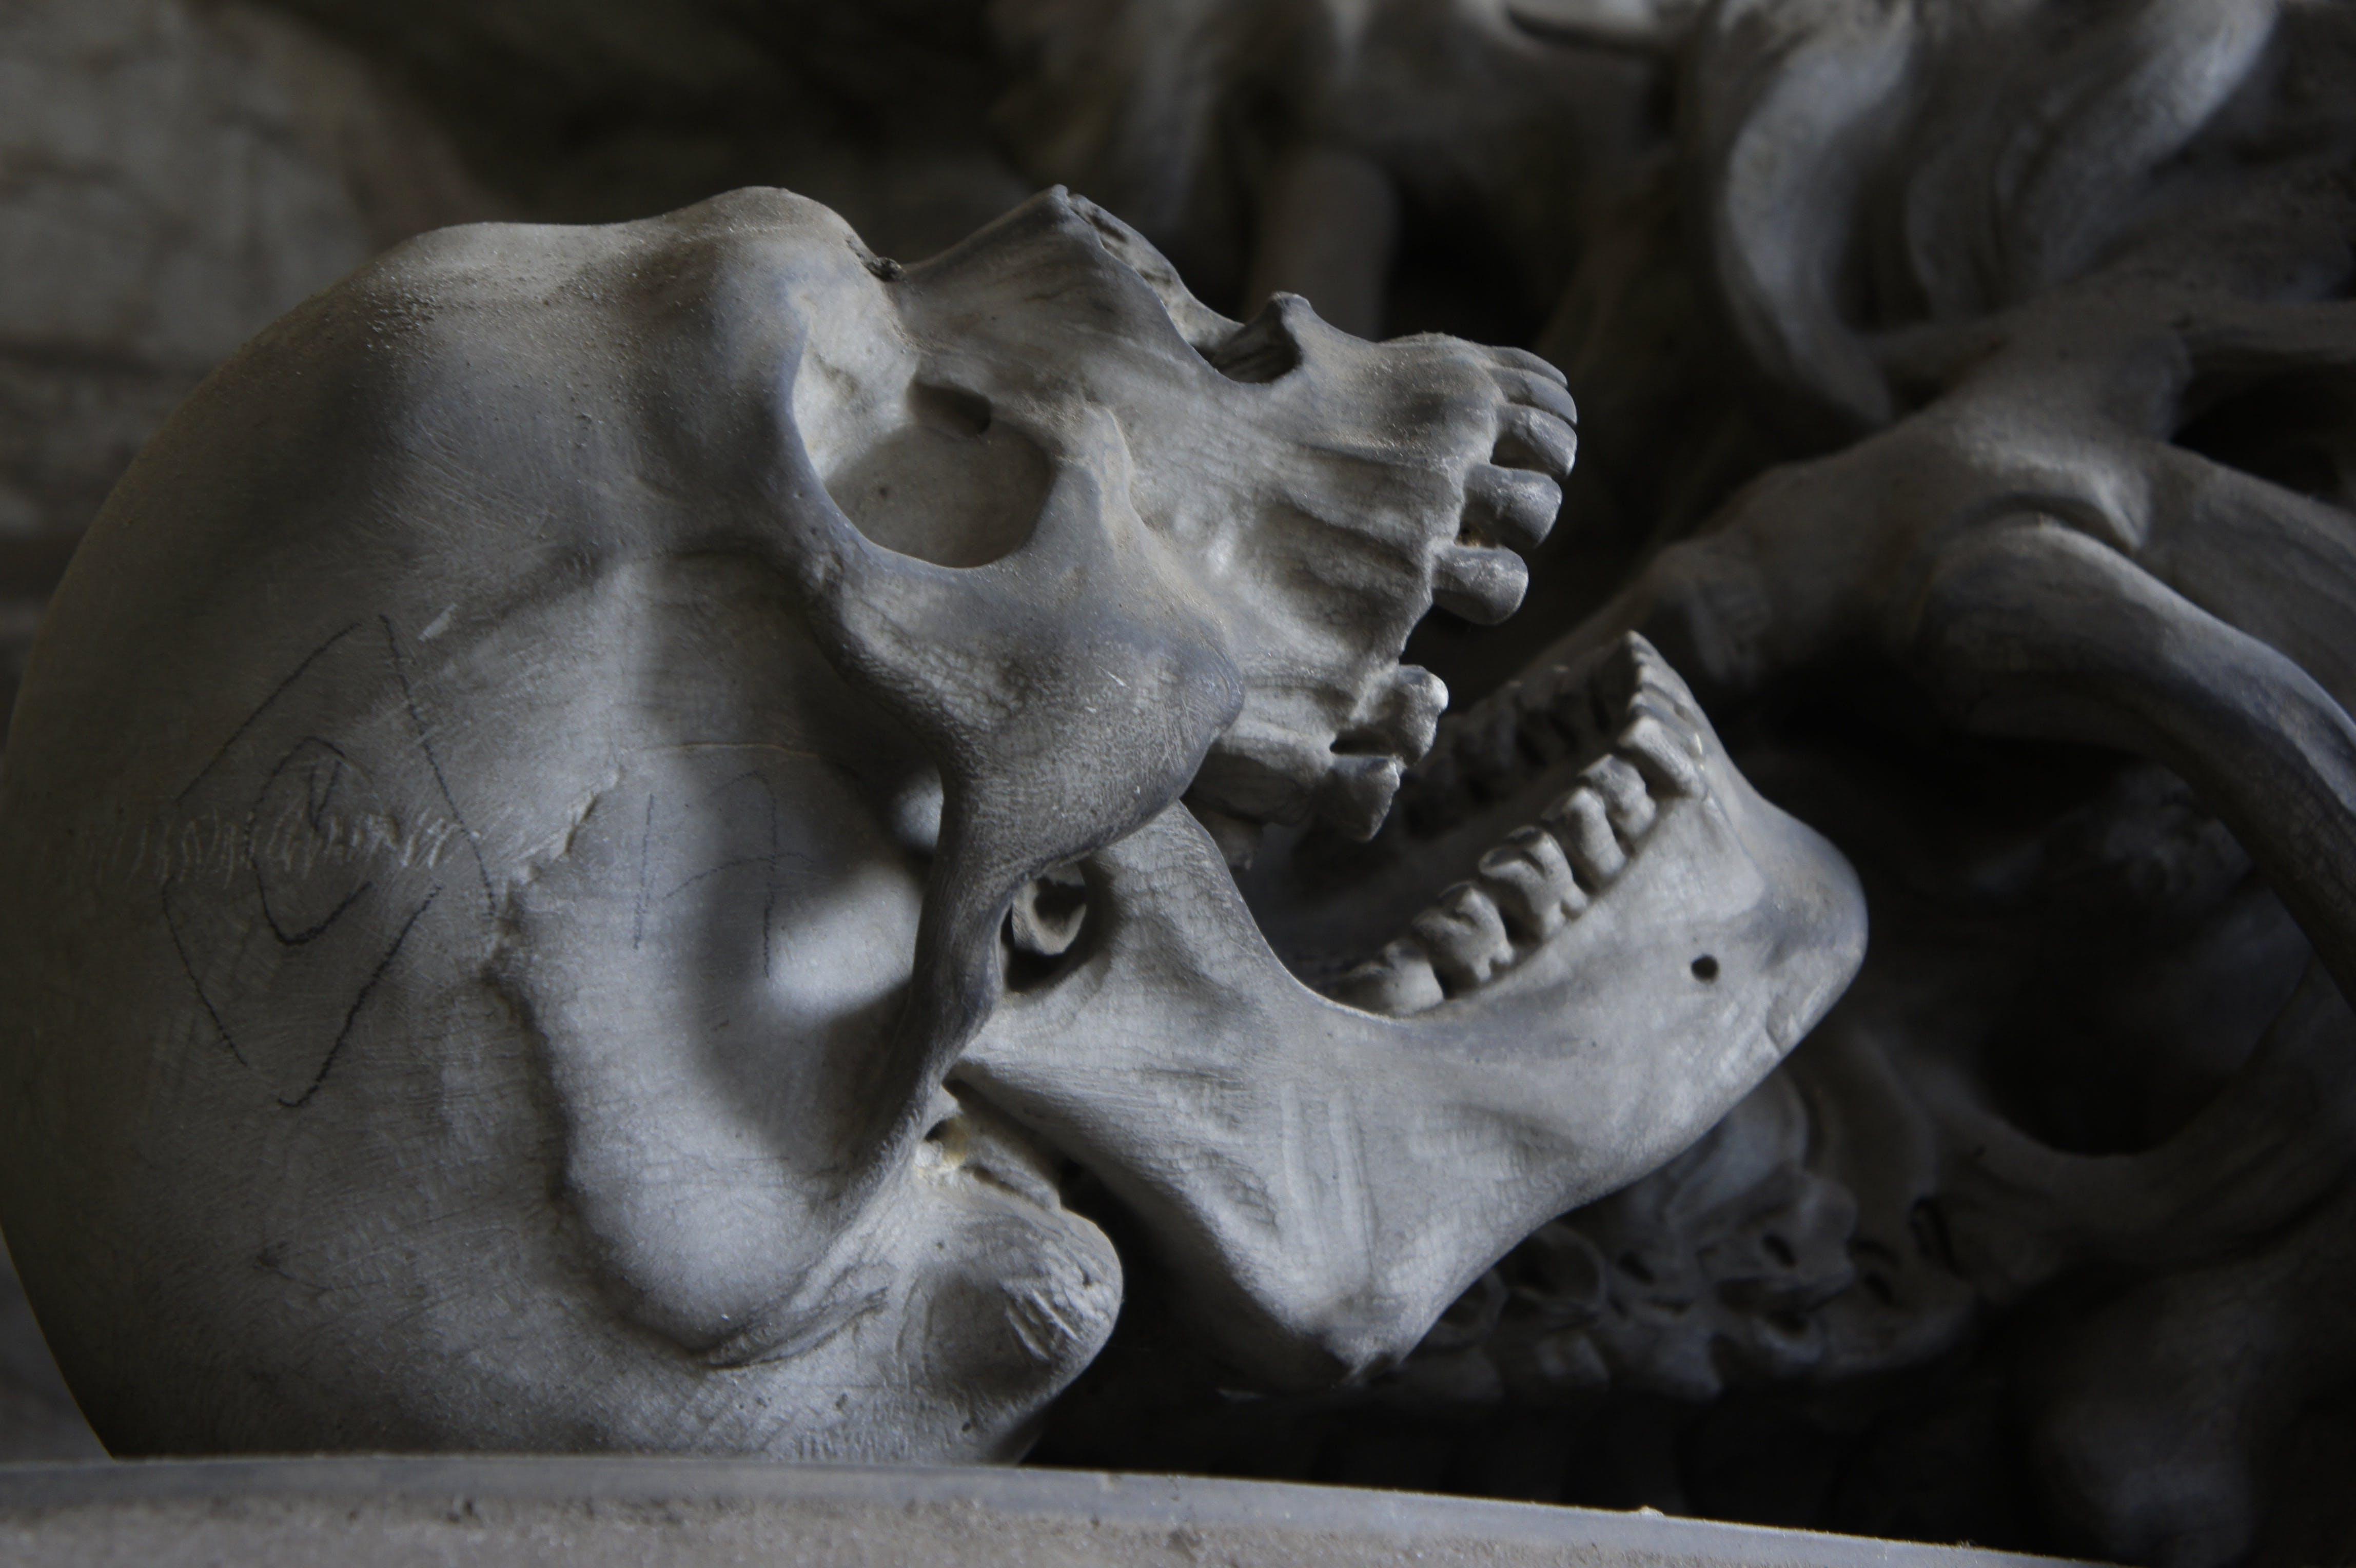 Free stock photo of weird, teeth, death, scary